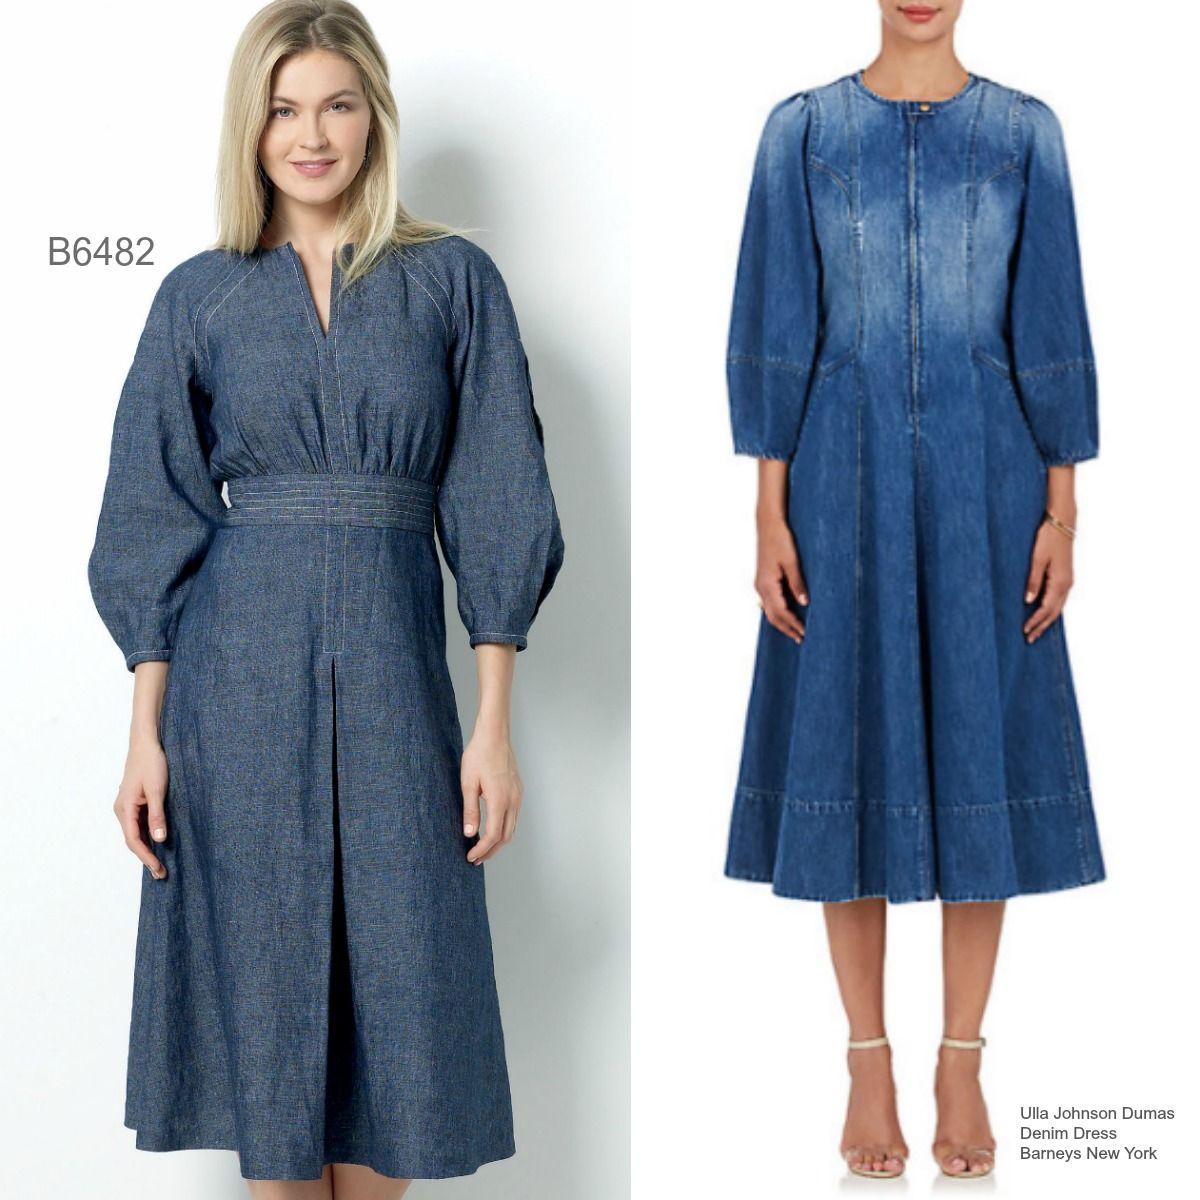 Sew the Look: Butterick B6482 Lisette denim dress sewing pattern.